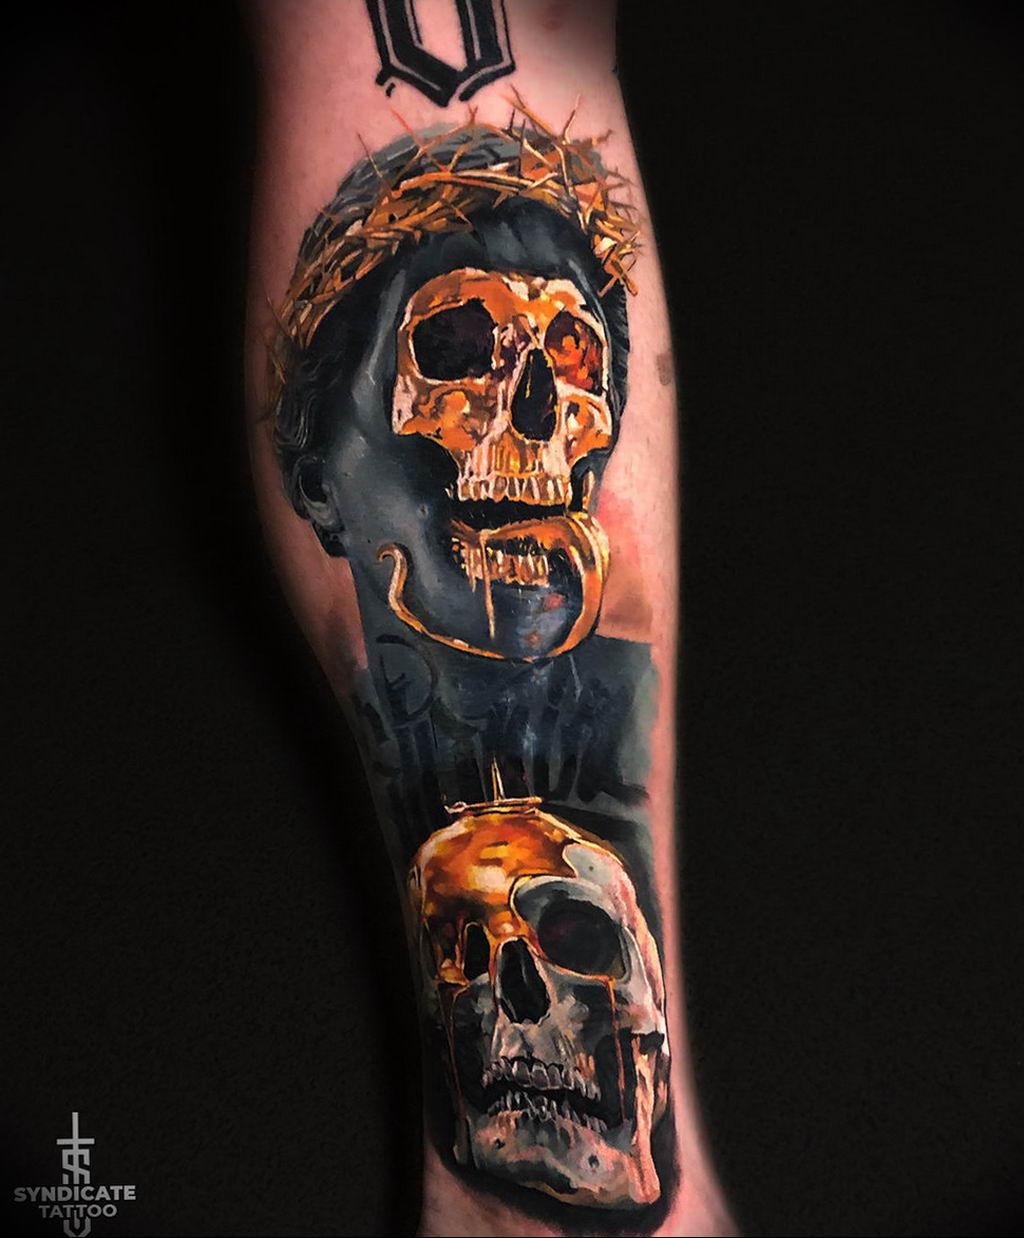 Фото тату студии Синдикат 09.09.2019 №130 - Syndicate tattoo - tatufoto.com